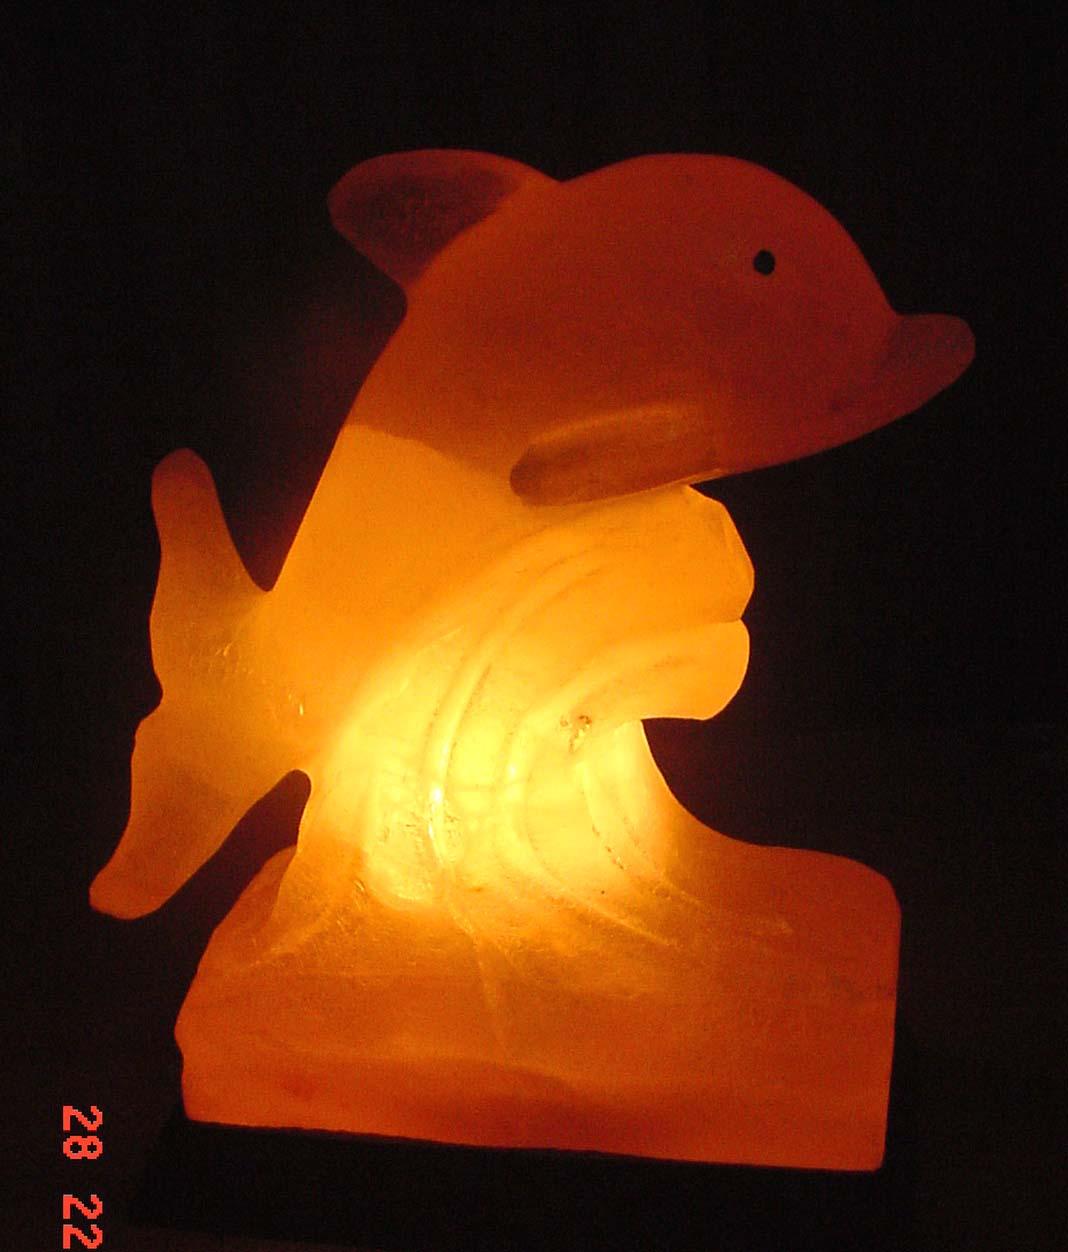 Dolphin Shape Rock Salt Lamp   Buy Rock Salt Lamp Product On Alibaba.com